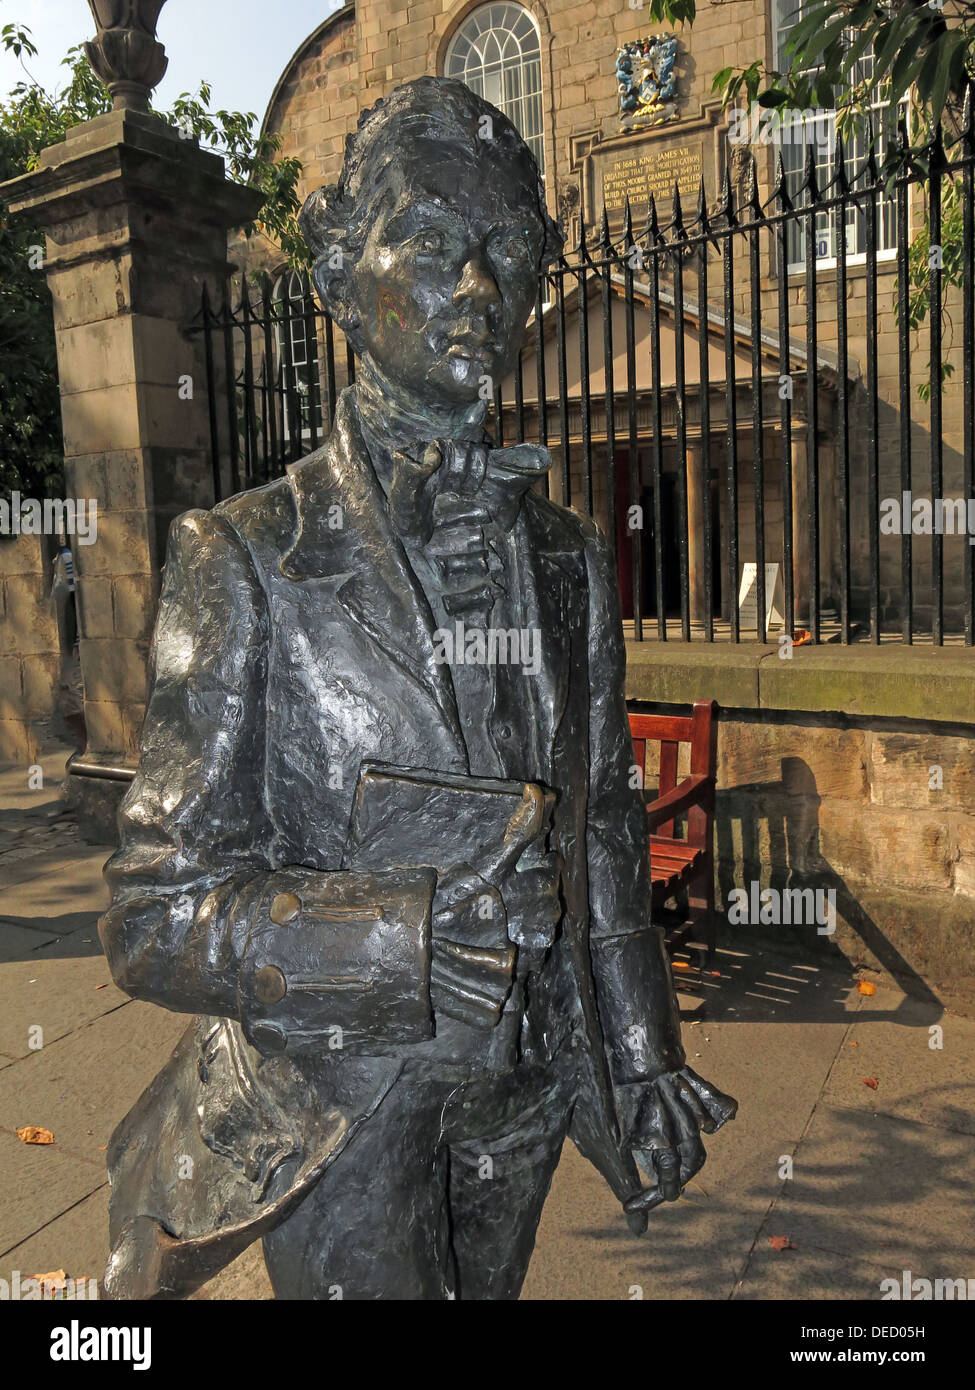 Robert Fergusson Scots Poet bronze Statue from the canongate Edinburgh Royal Mile. - Stock Image